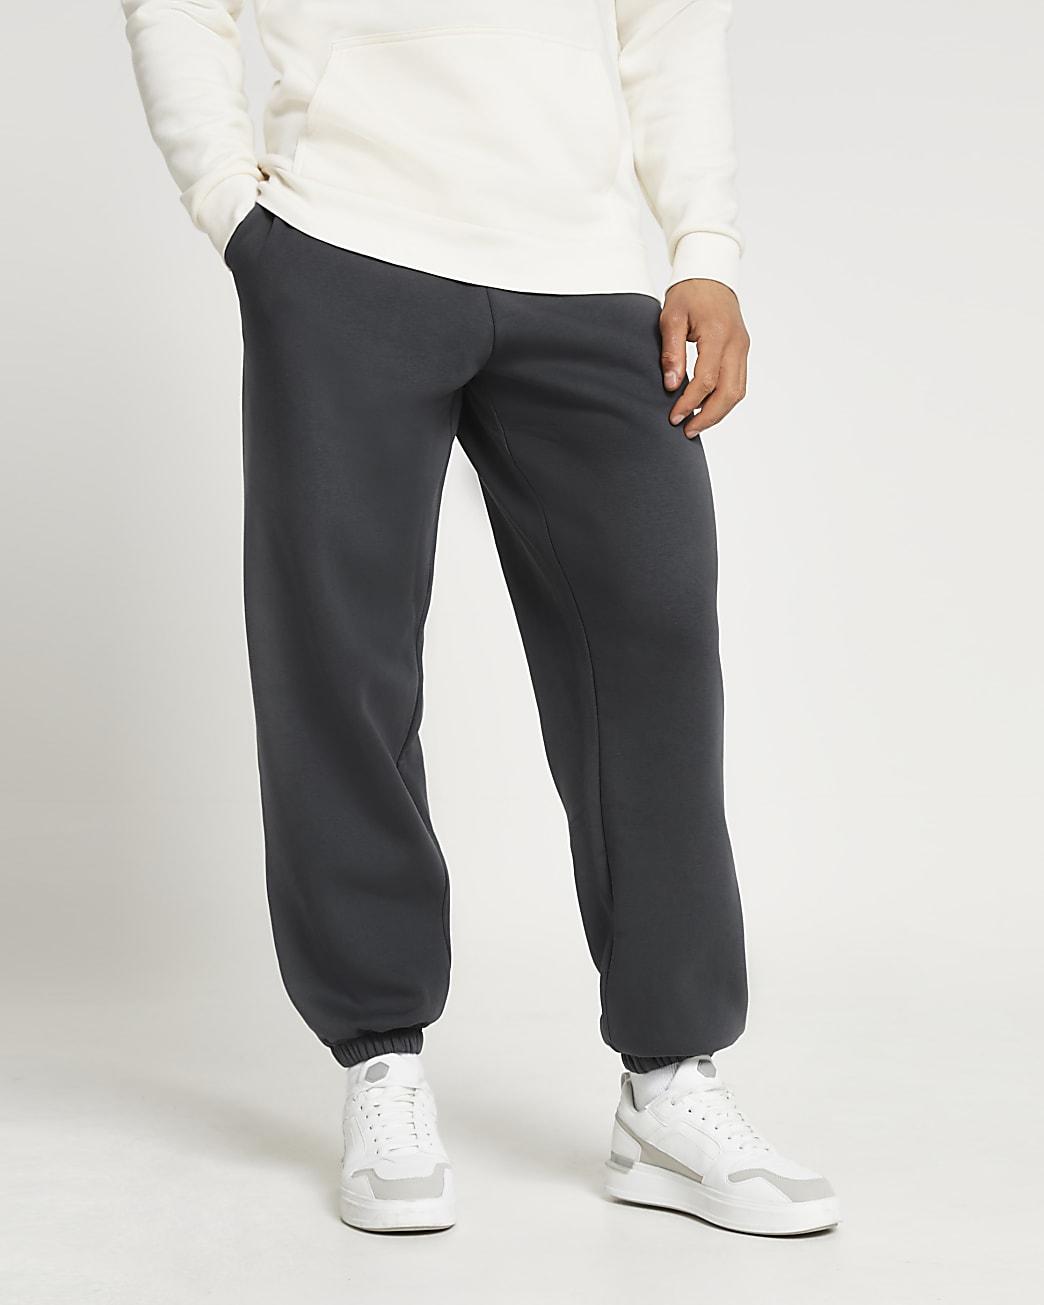 Grey oversized joggers